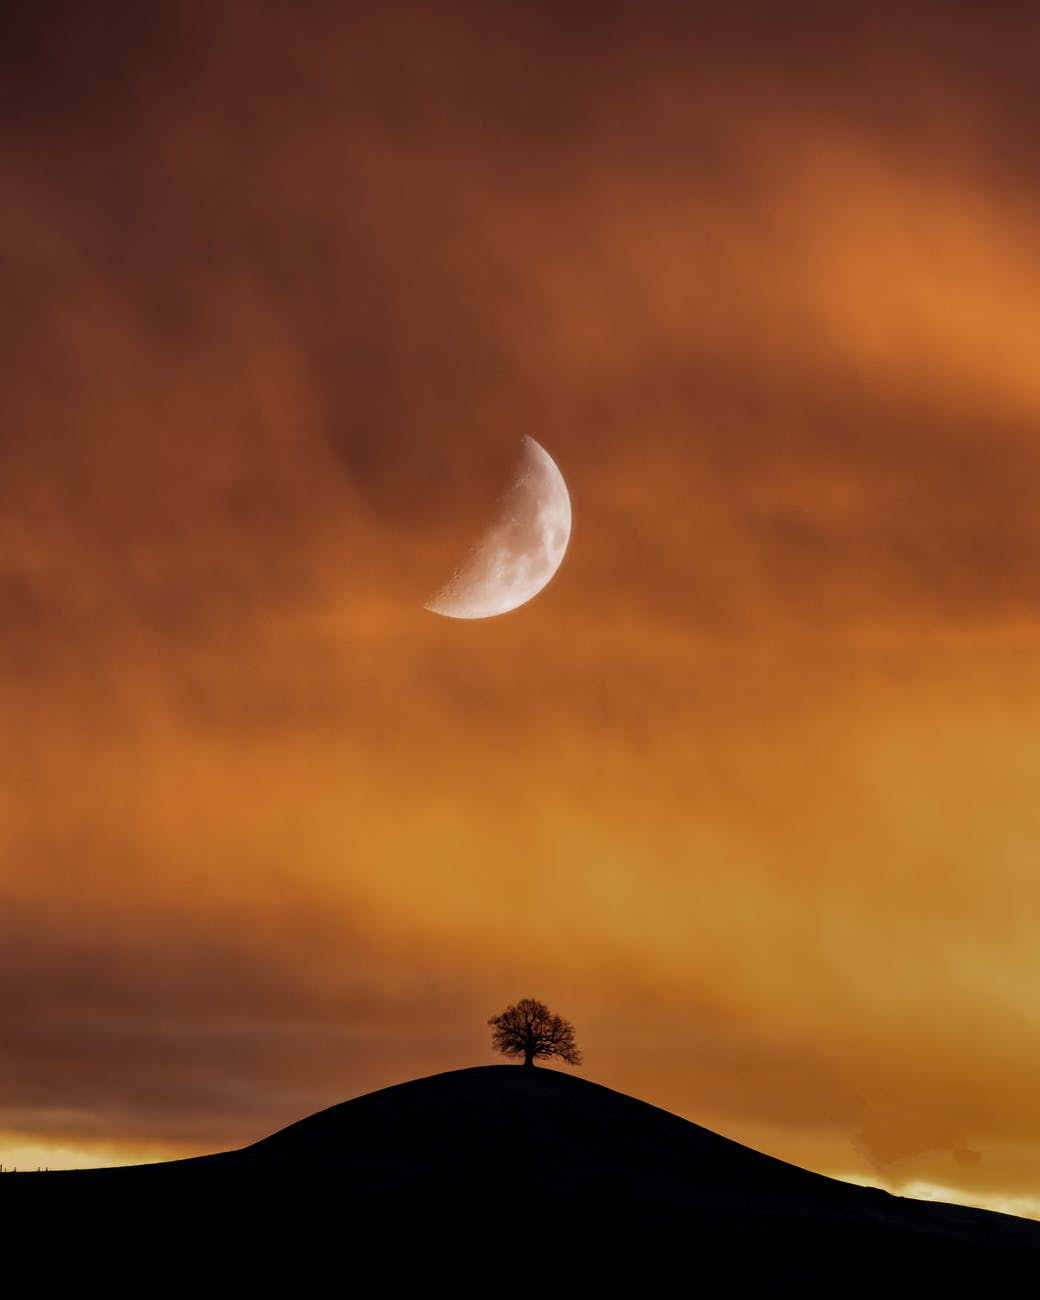 silhouette of tree under half moon